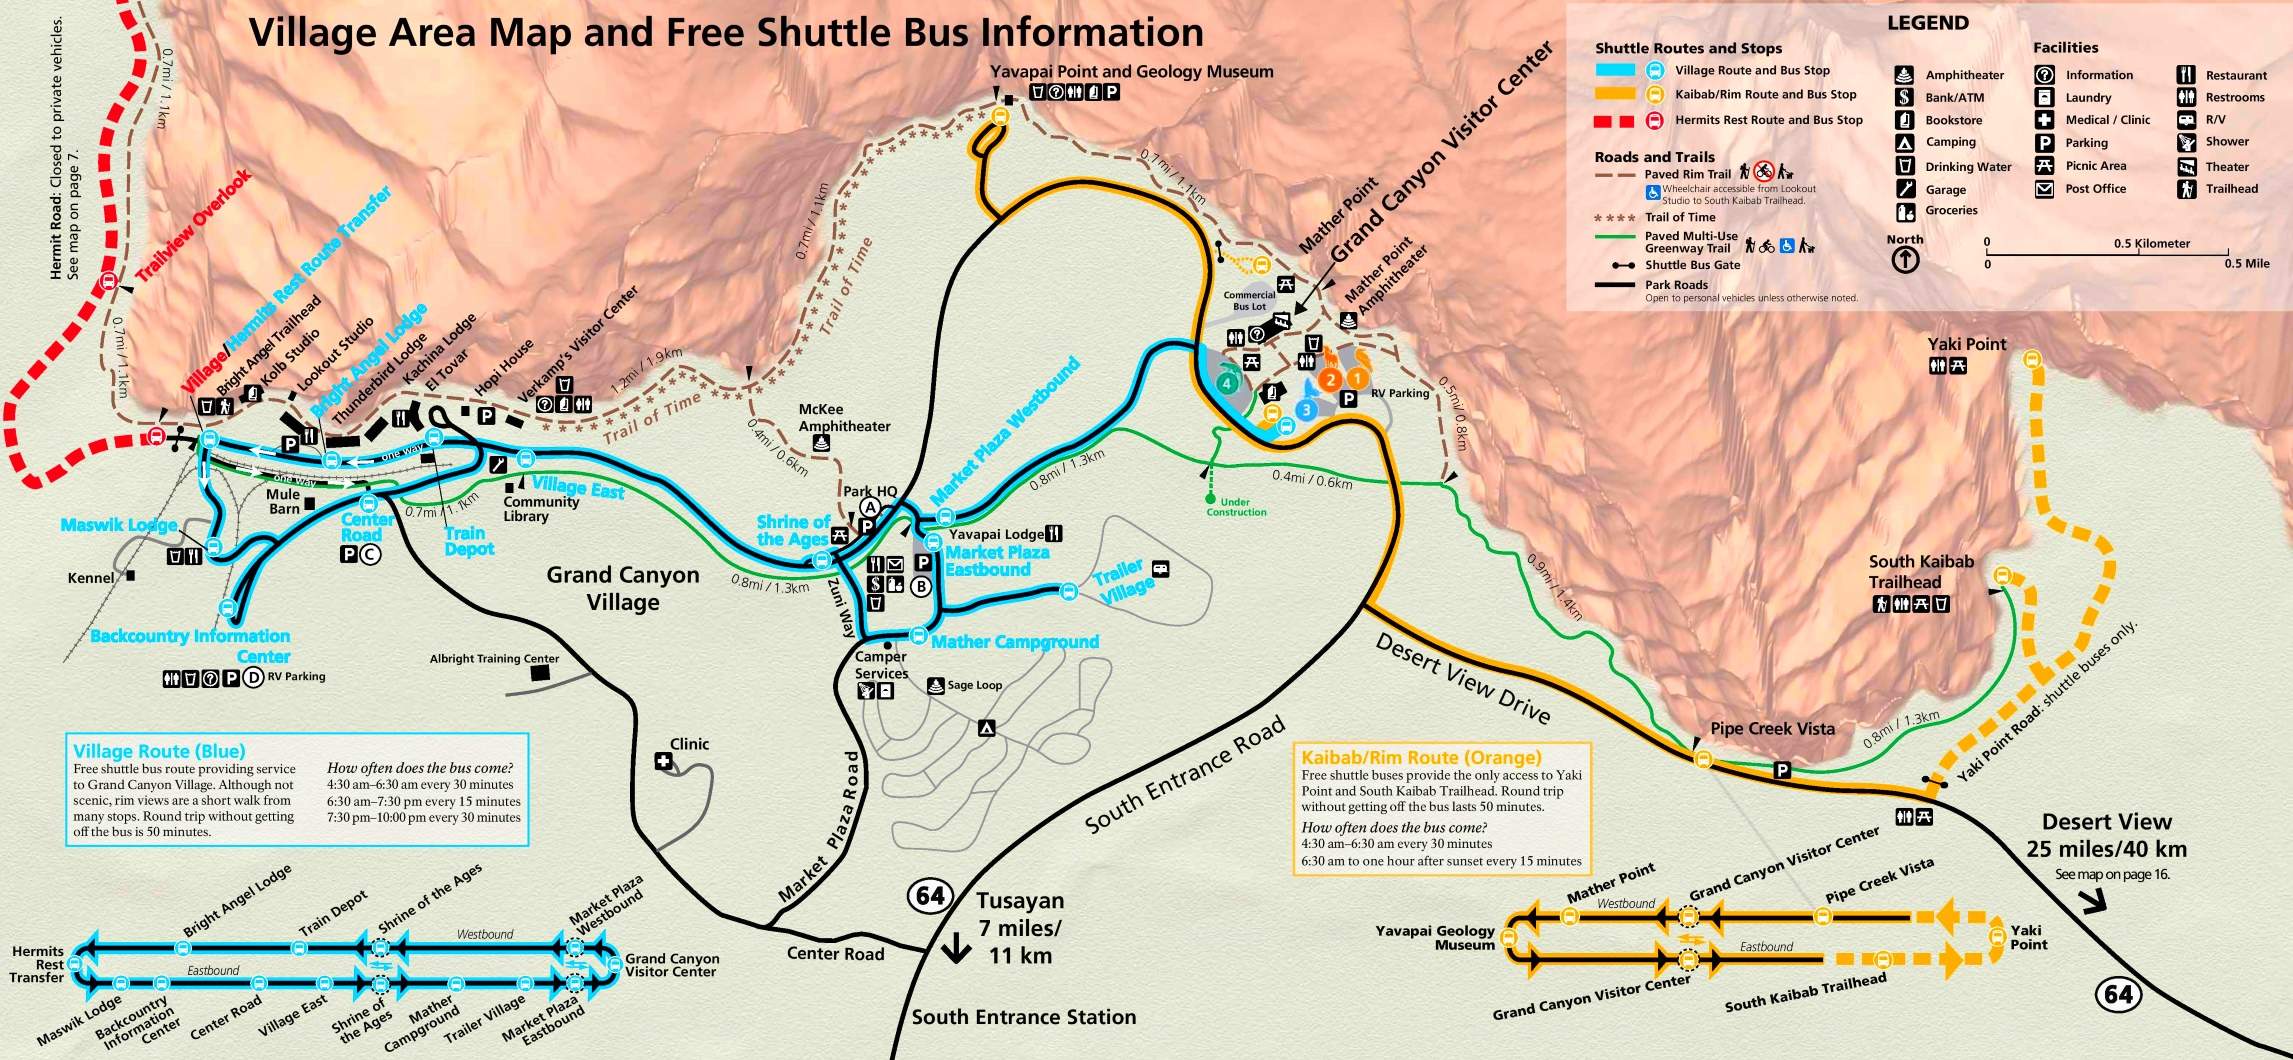 map of grand canyon south rim Grand Canyon South Rim Village Shuttle Map map of grand canyon south rim